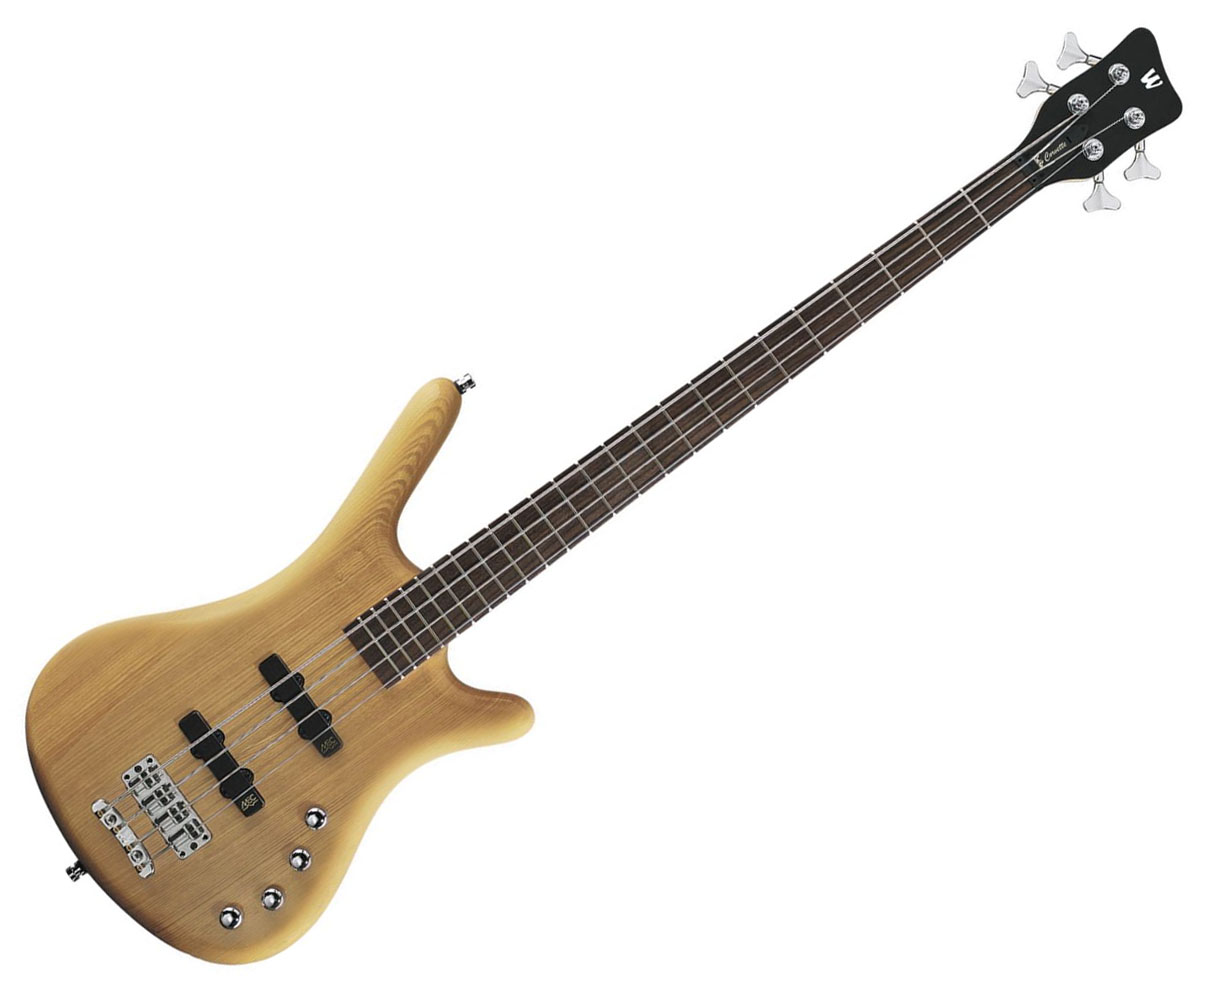 Warwick Corvette Basic Active Natural Satin 4 String Bass